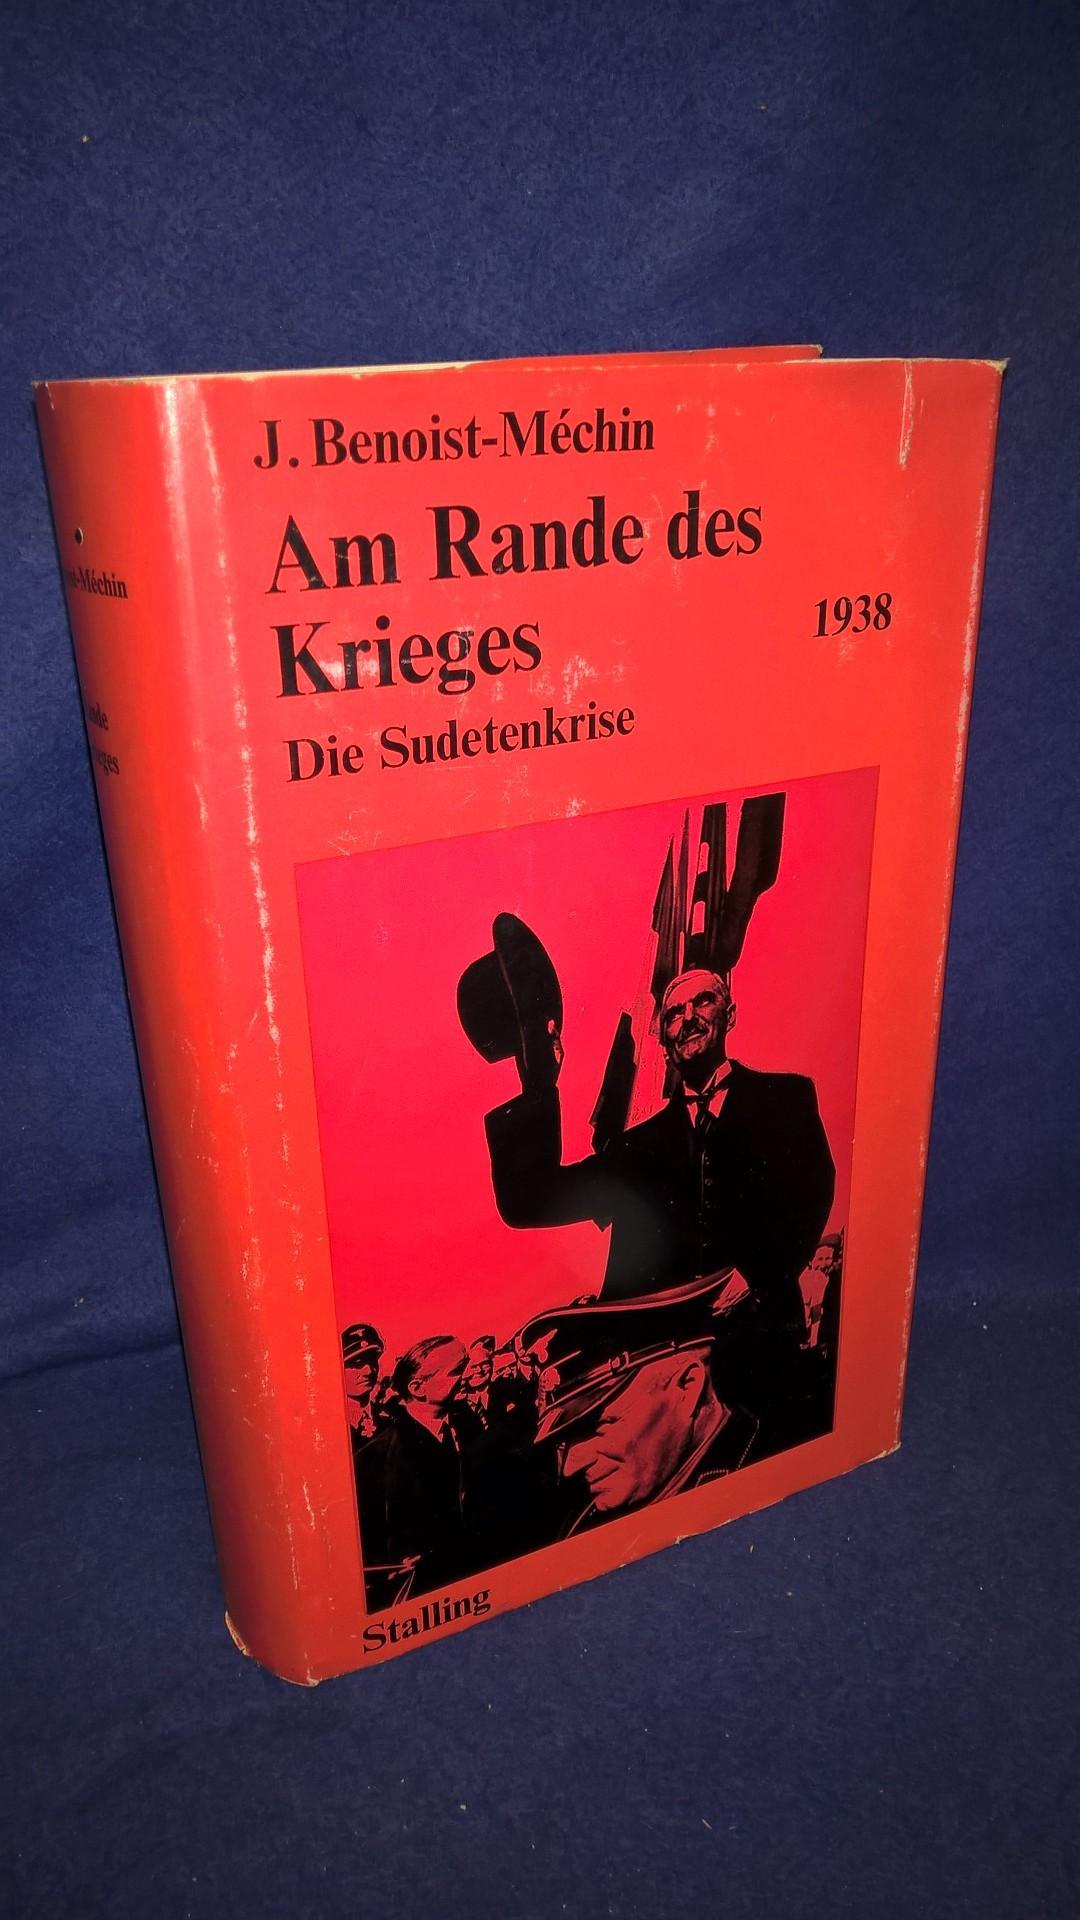 Am Rande des Krieges 1938 - Die Sudetenkrise